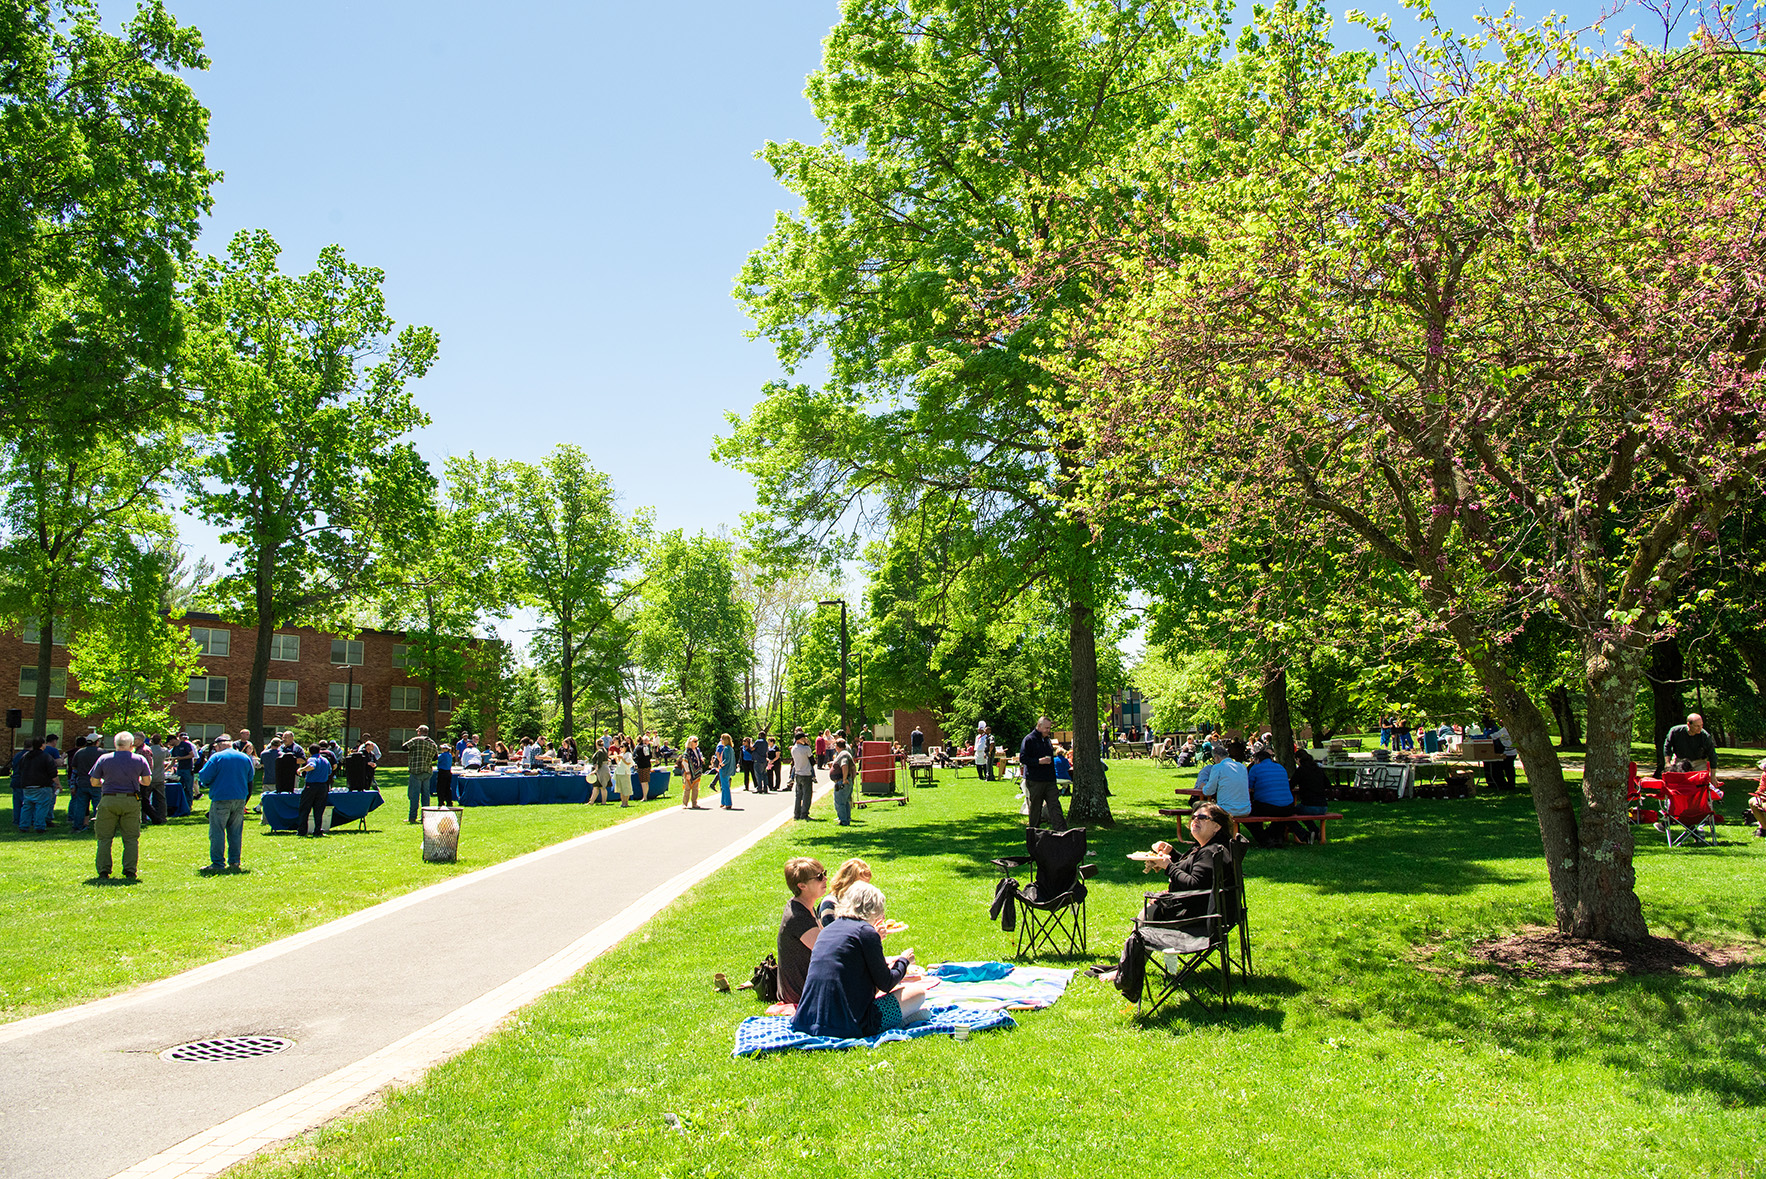 Suny New Paltz Academic Calendar Spring 2022.A Beautiful Day For A Picnic At Suny New Paltz Suny New Paltz News